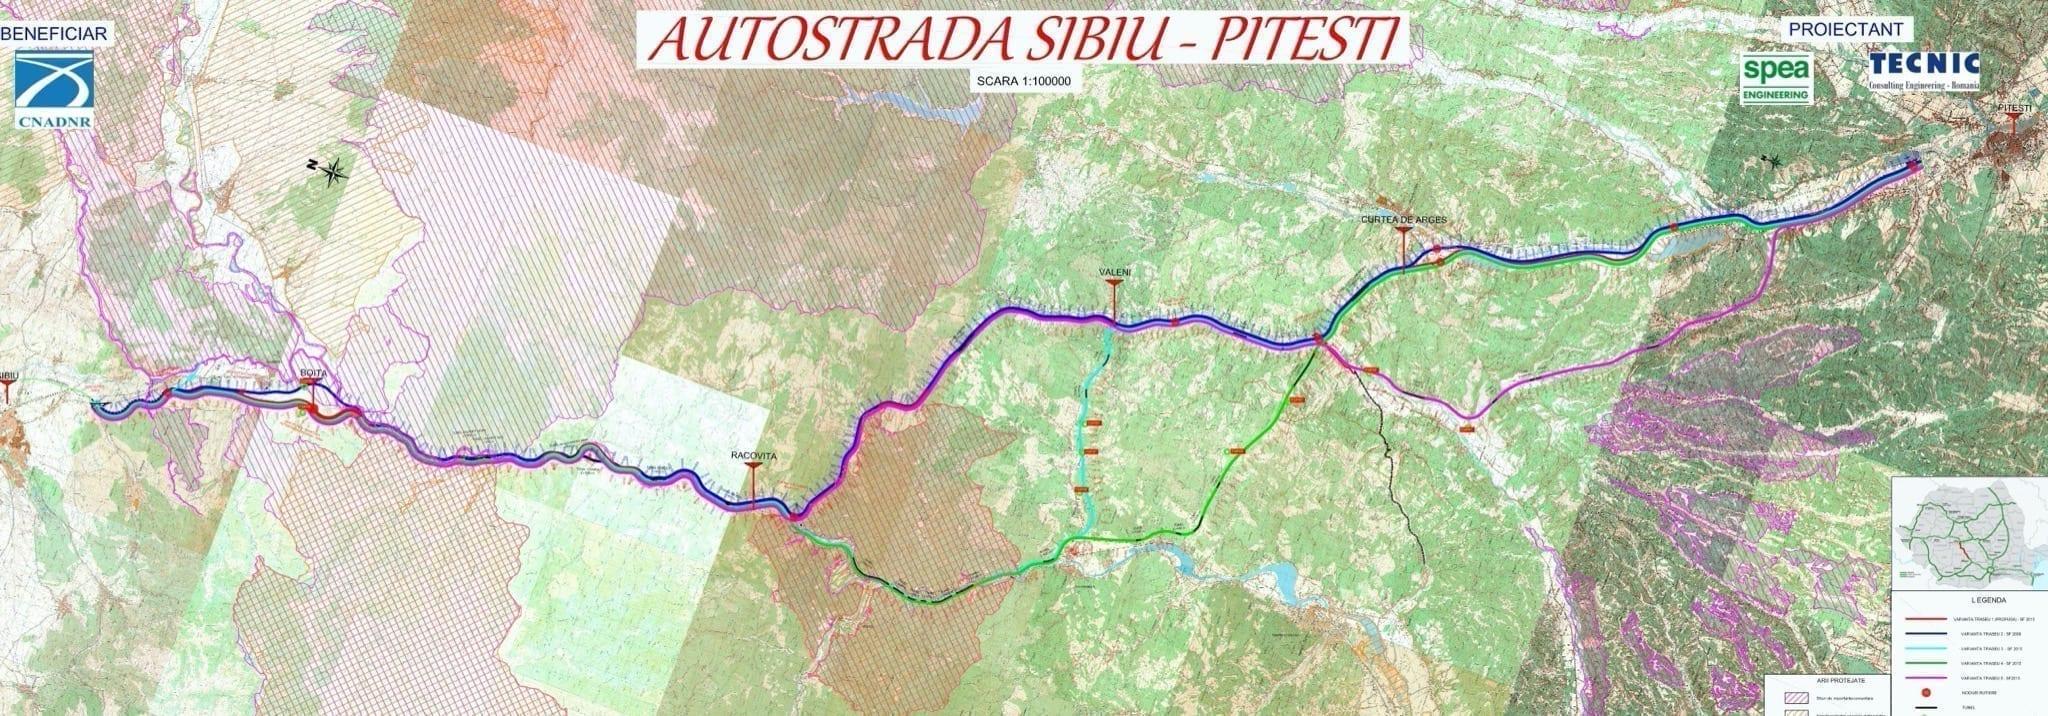 Sibiu Pitesti autostrada - Sibiu Pitesti autostrada